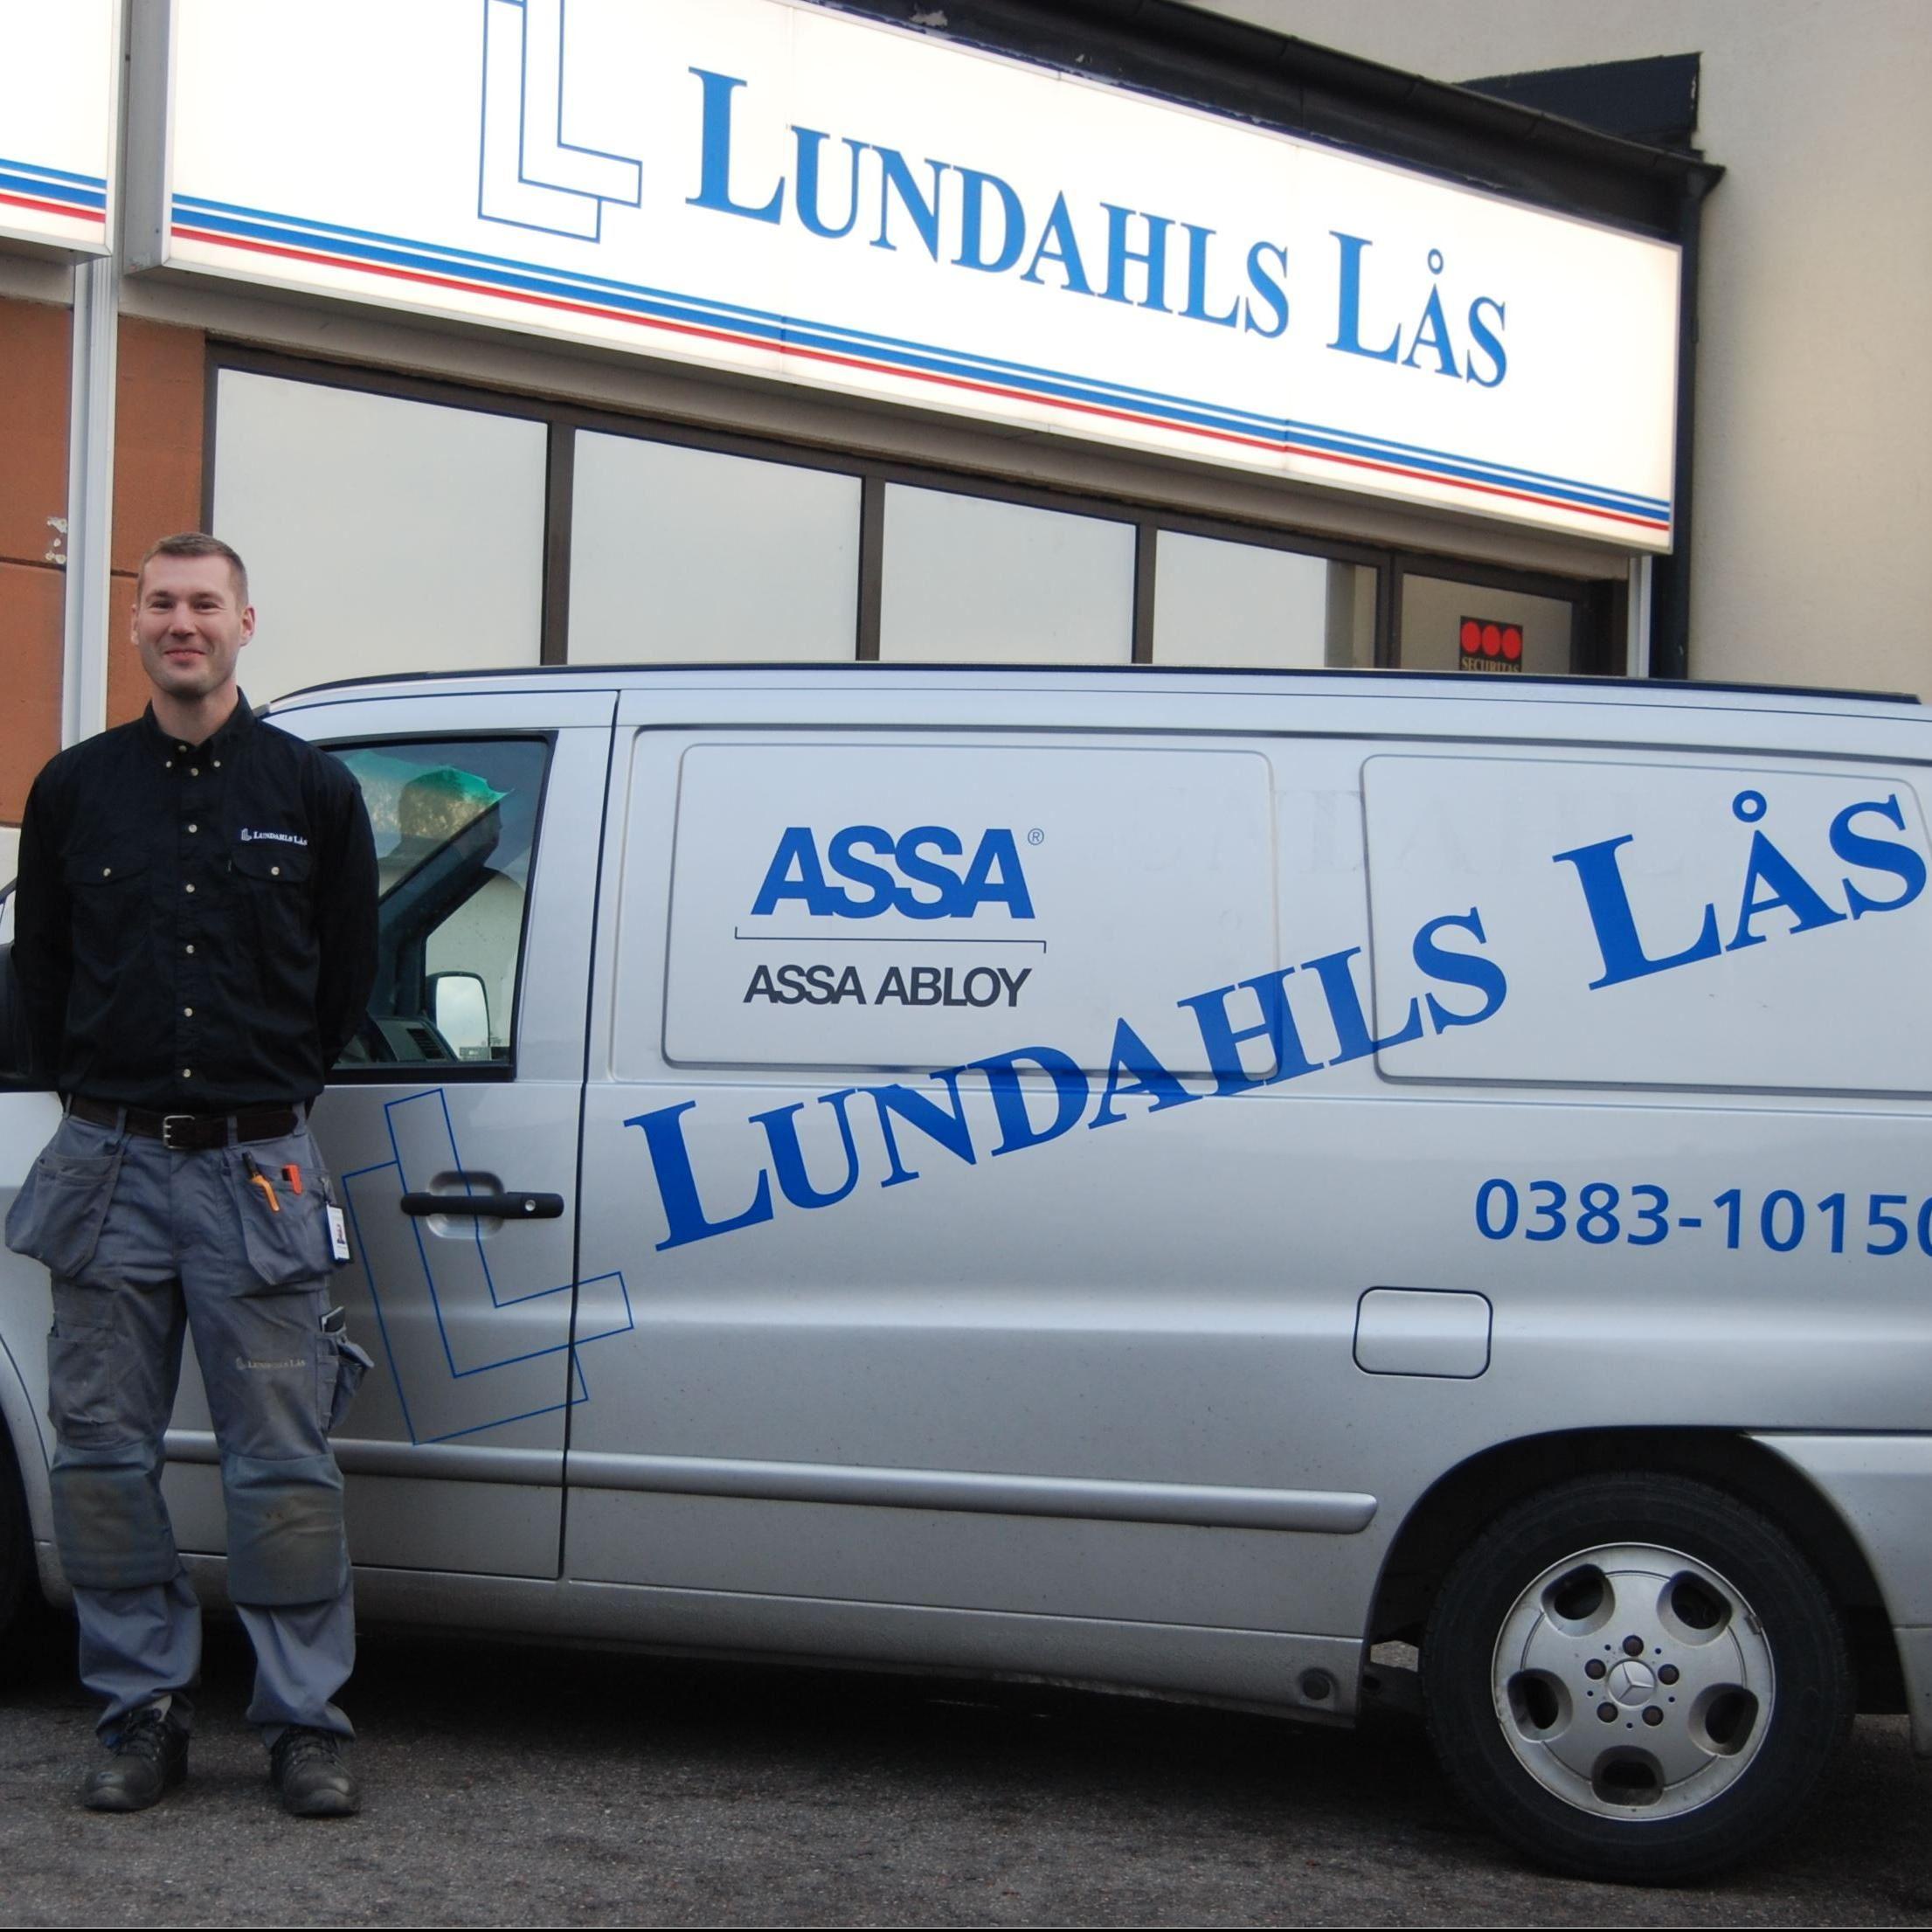 Lundahls Lås